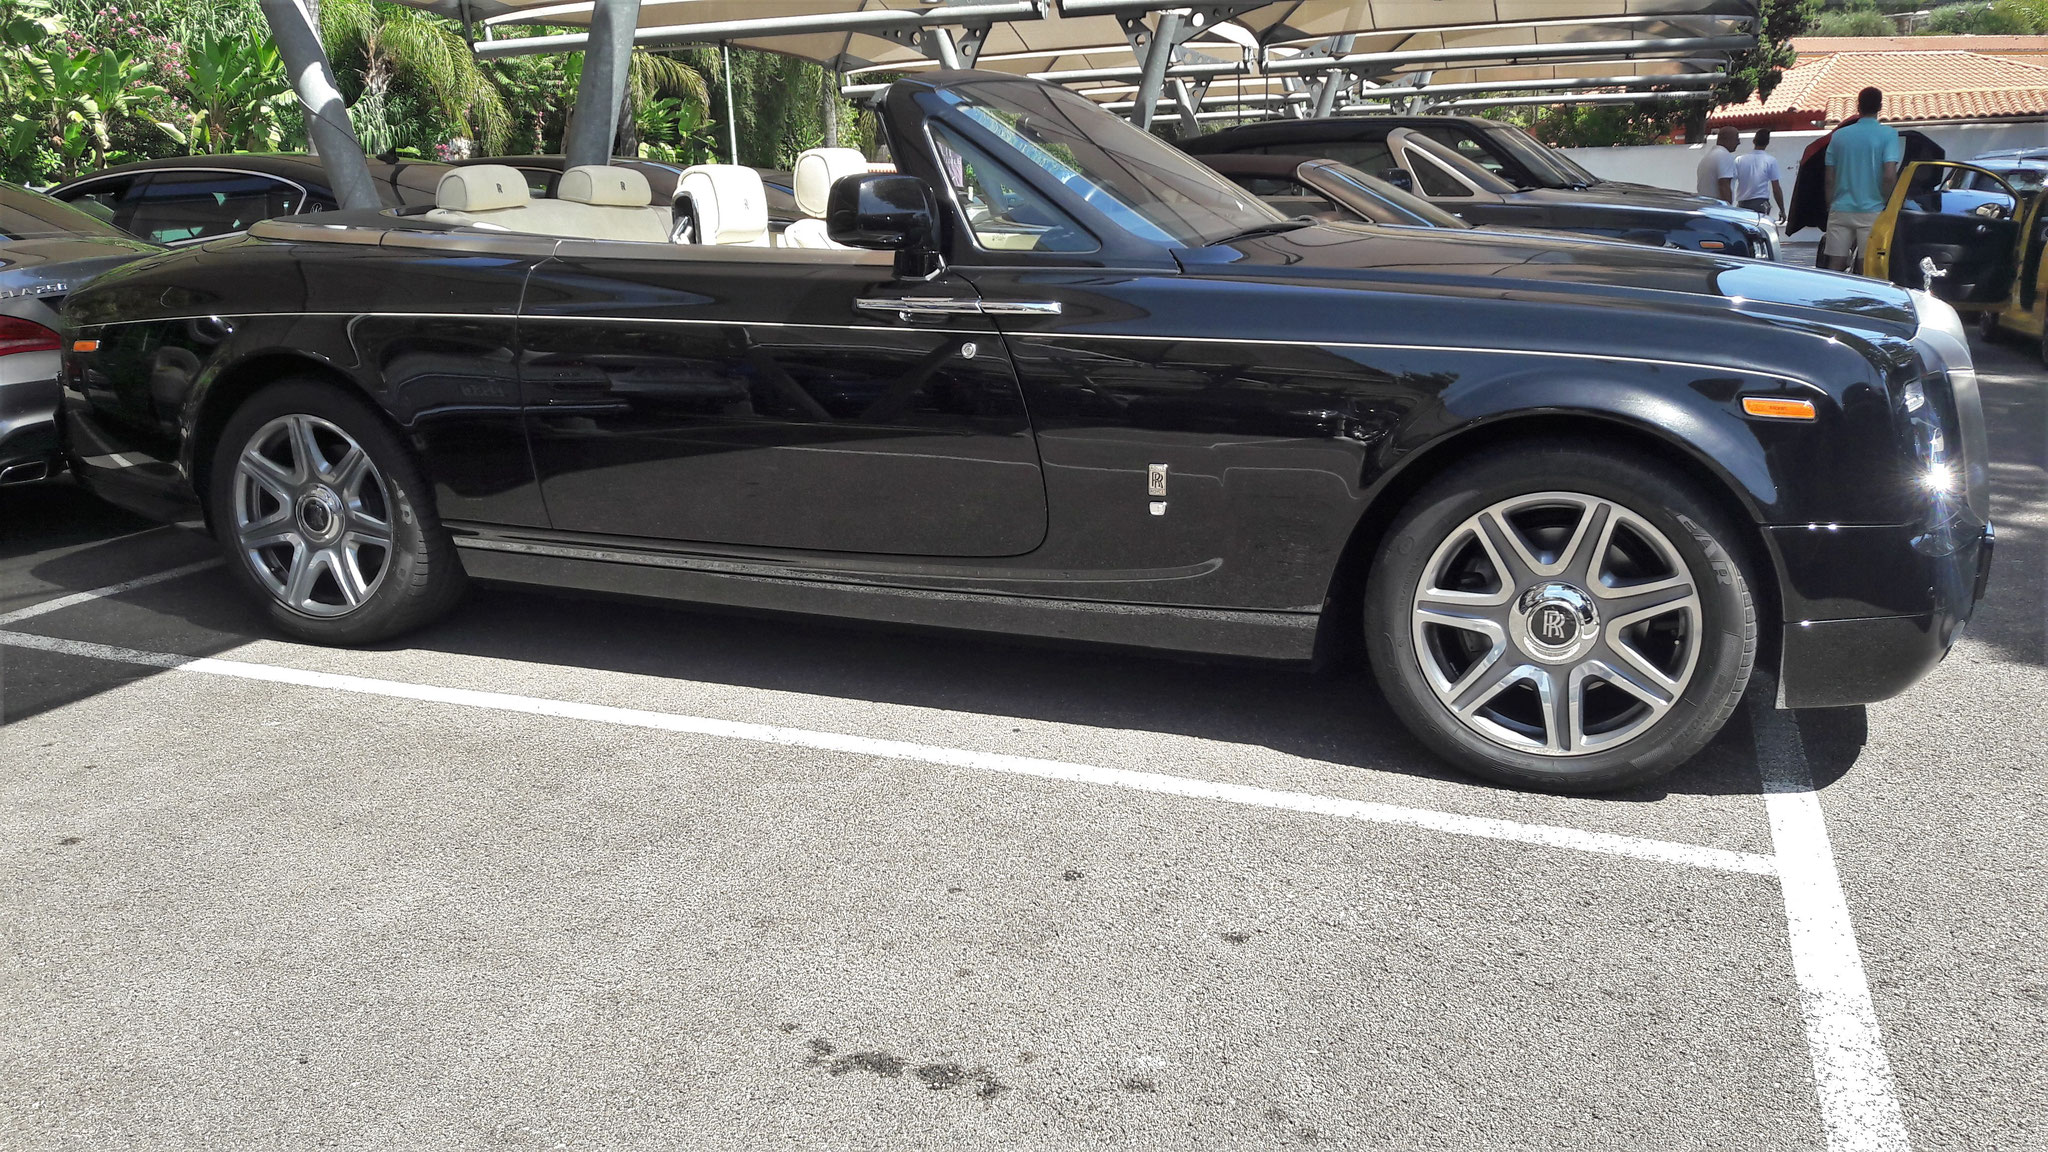 Rolls Royce Drophead - Q494 (MC)